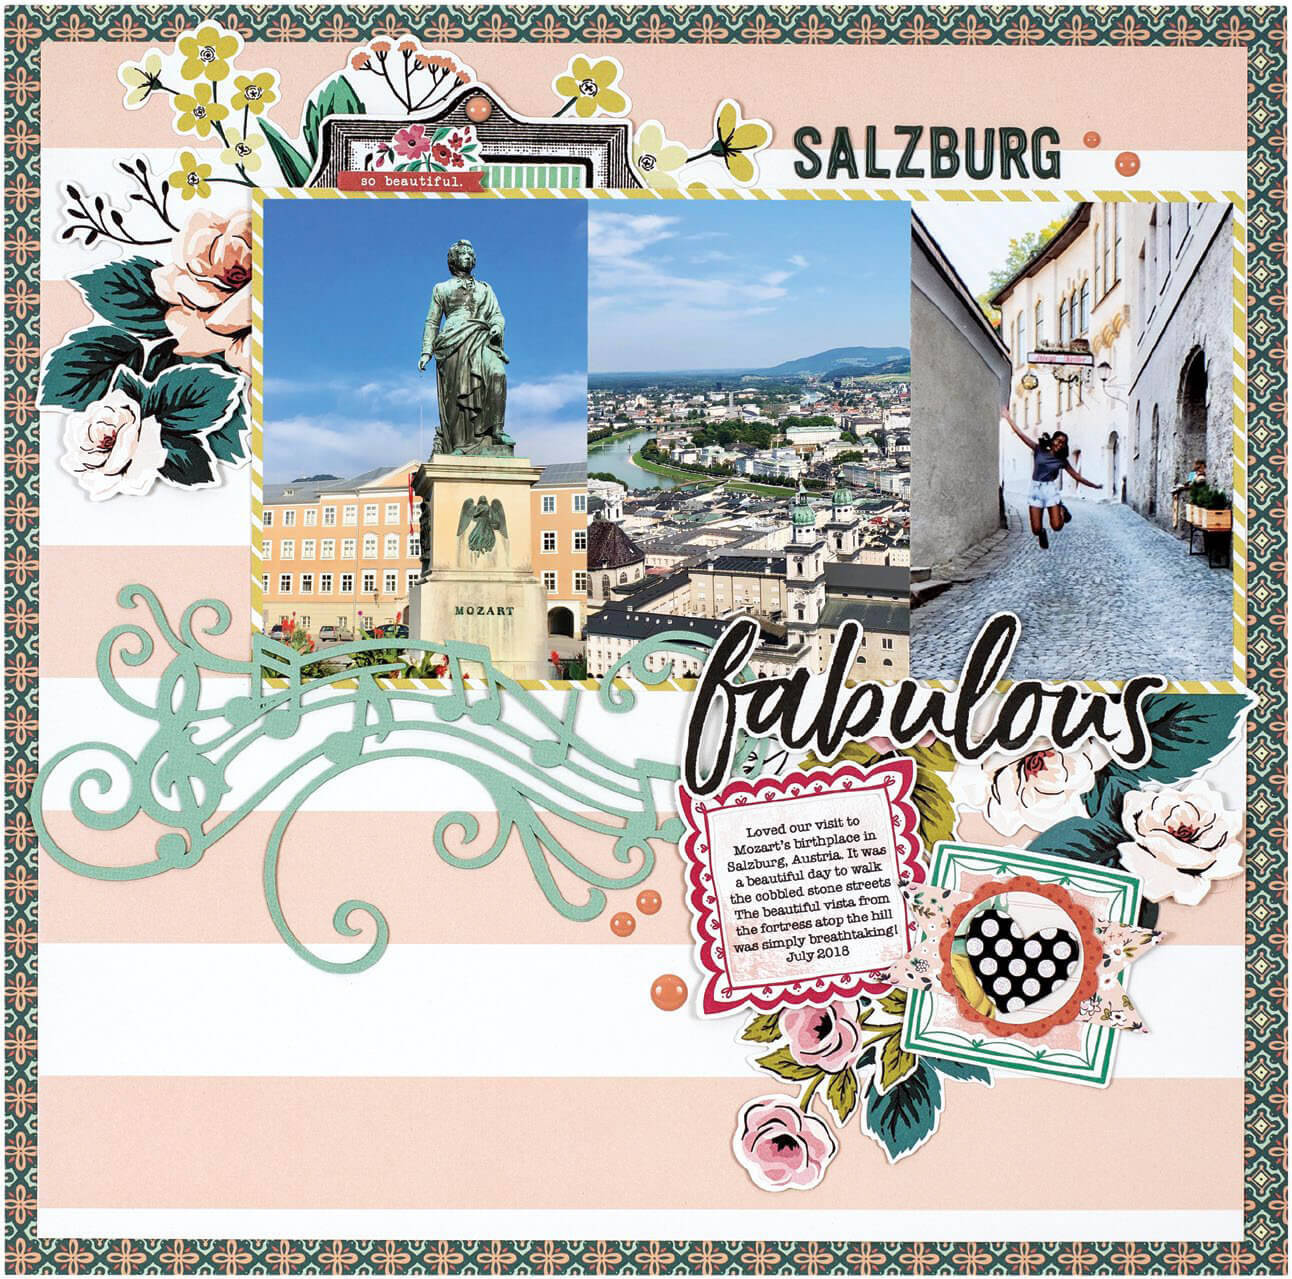 Scrapbook & Cards Today - Summer 2019 - Salzburg layout by Virginia Nebel